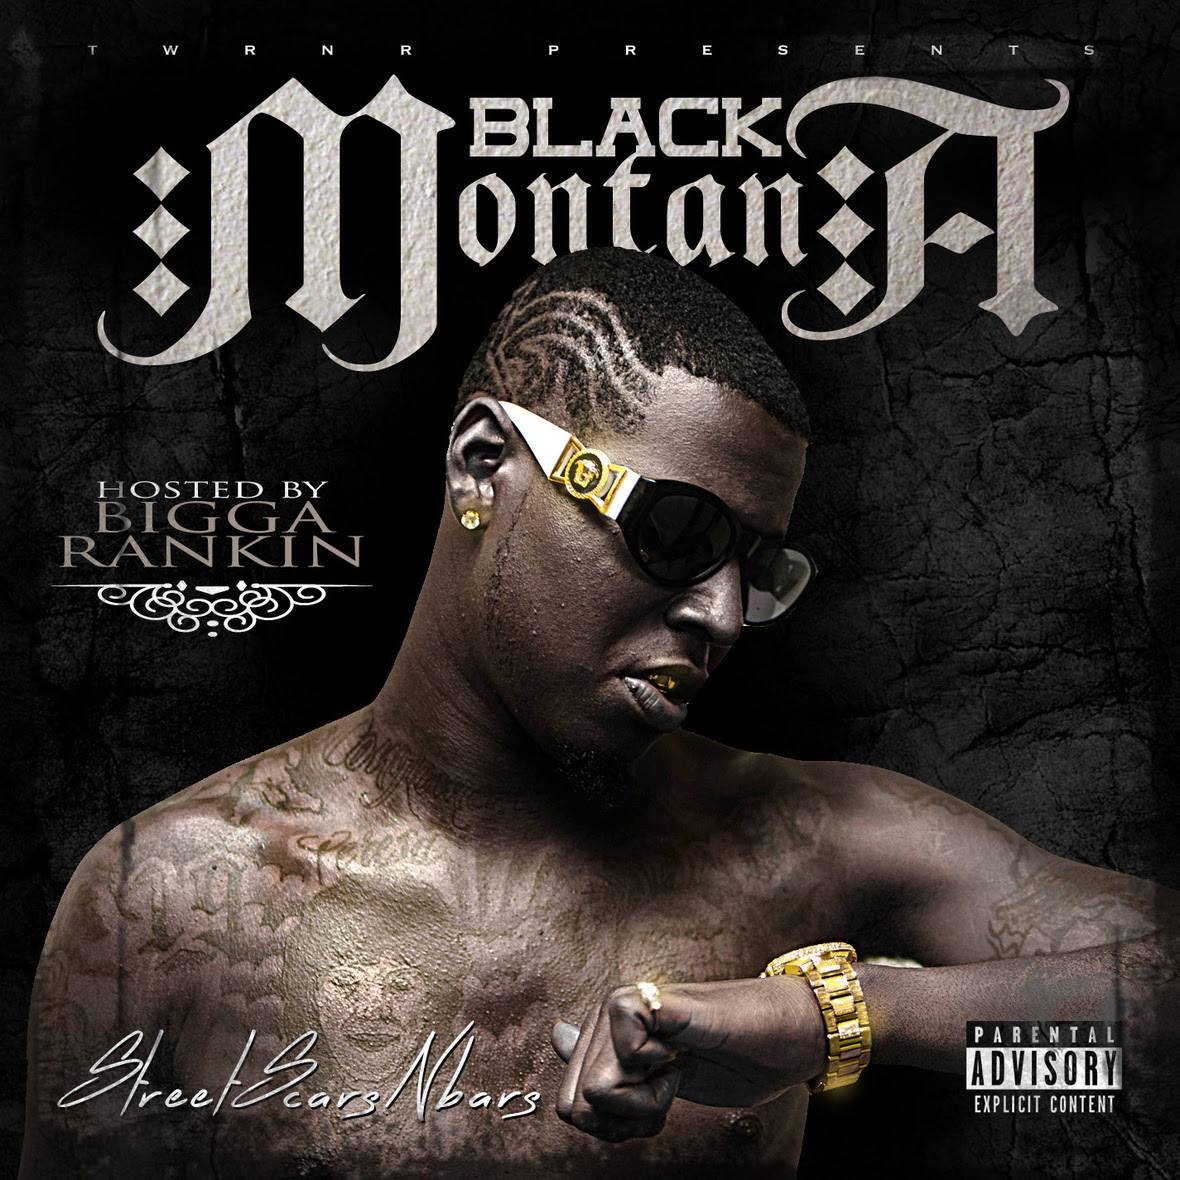 Black Montana